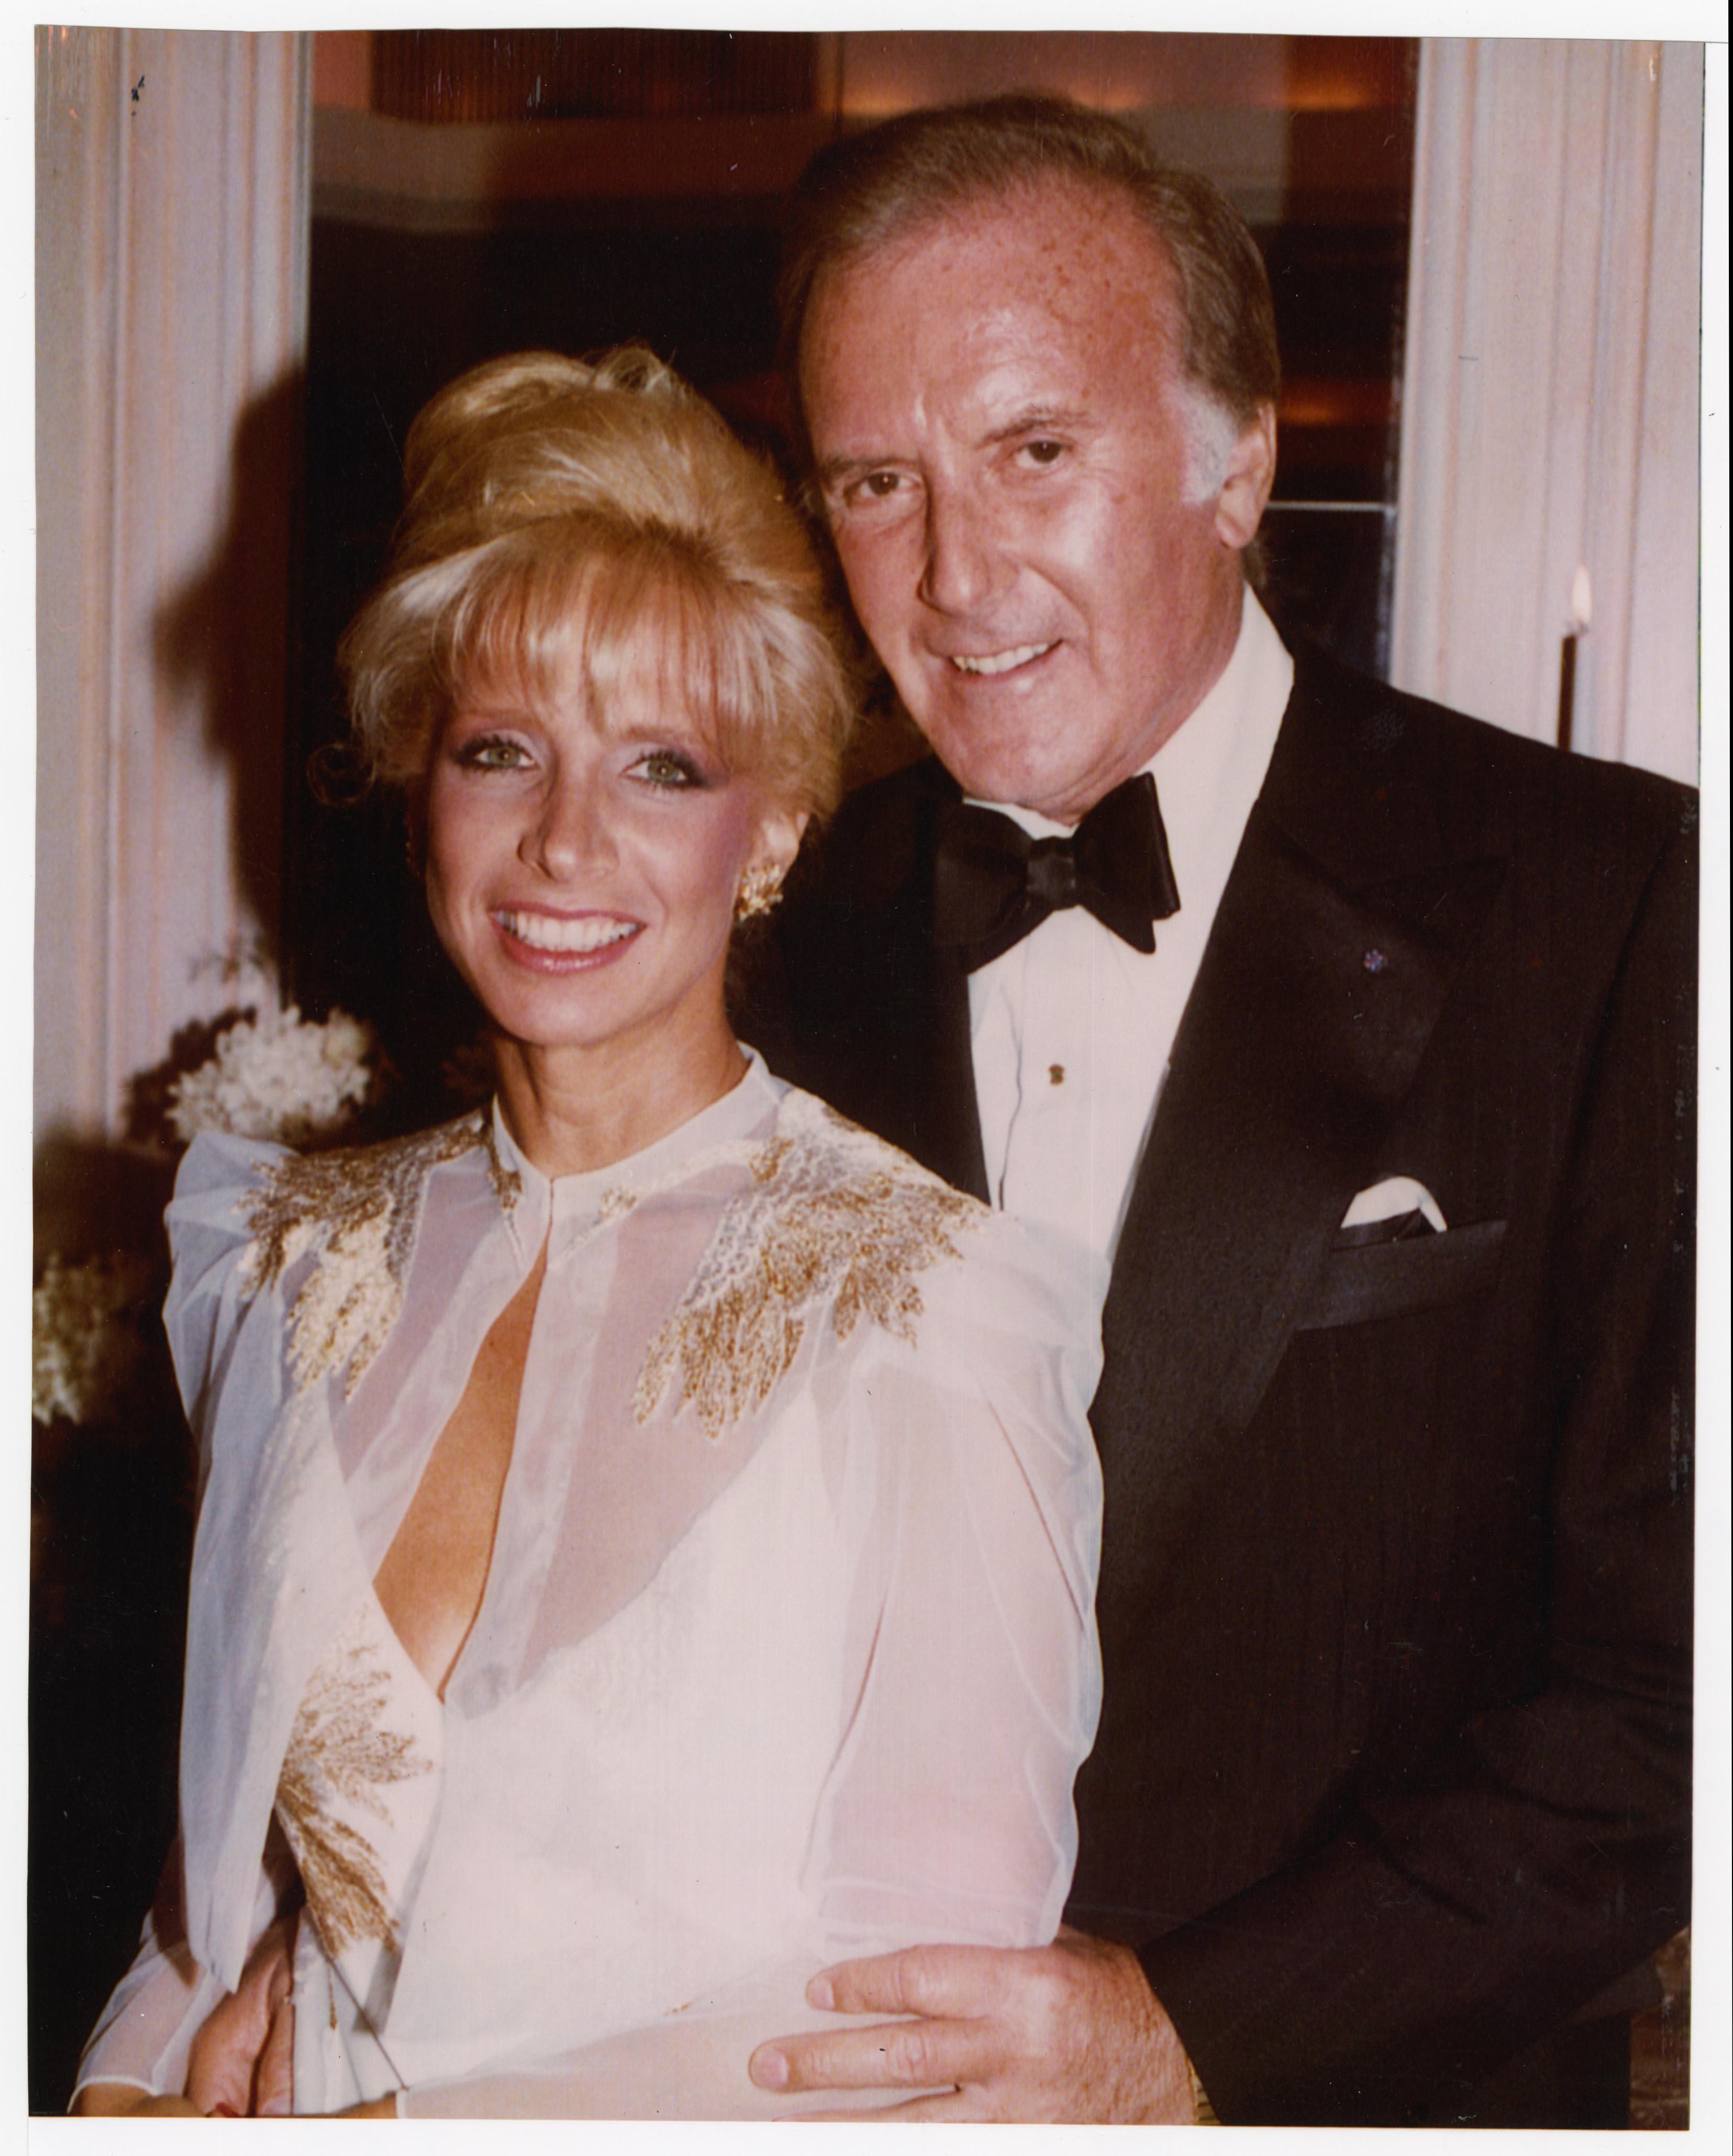 Harold and Marny Glasser